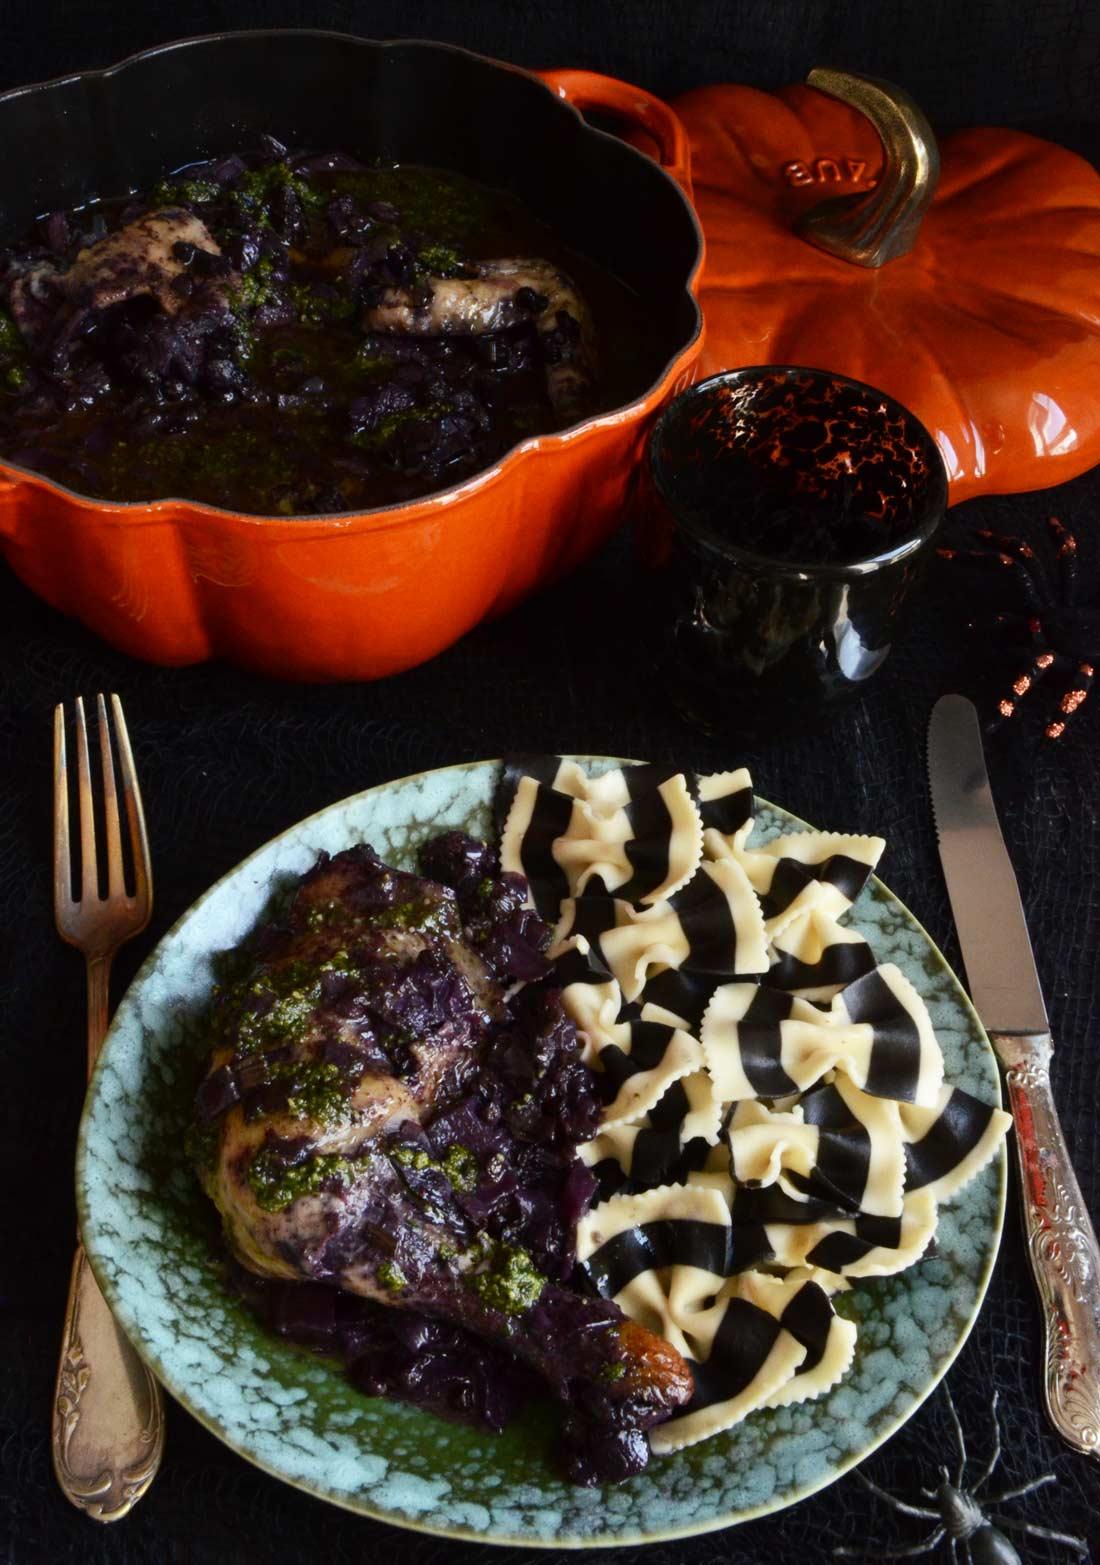 poulet violet la sauce verte recette halloween sal e. Black Bedroom Furniture Sets. Home Design Ideas